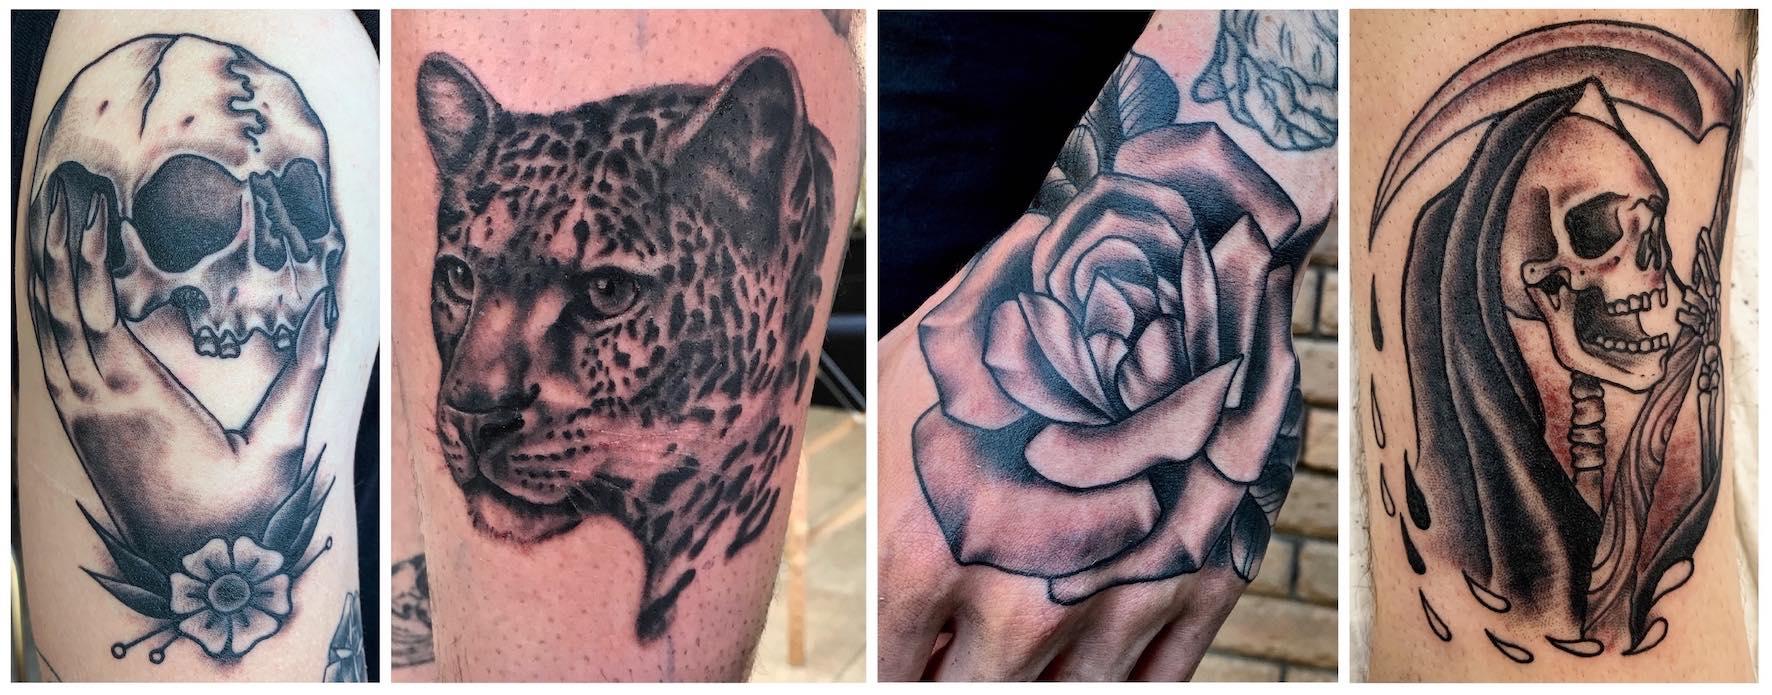 American Traditional tattoos done by Mason Murdey